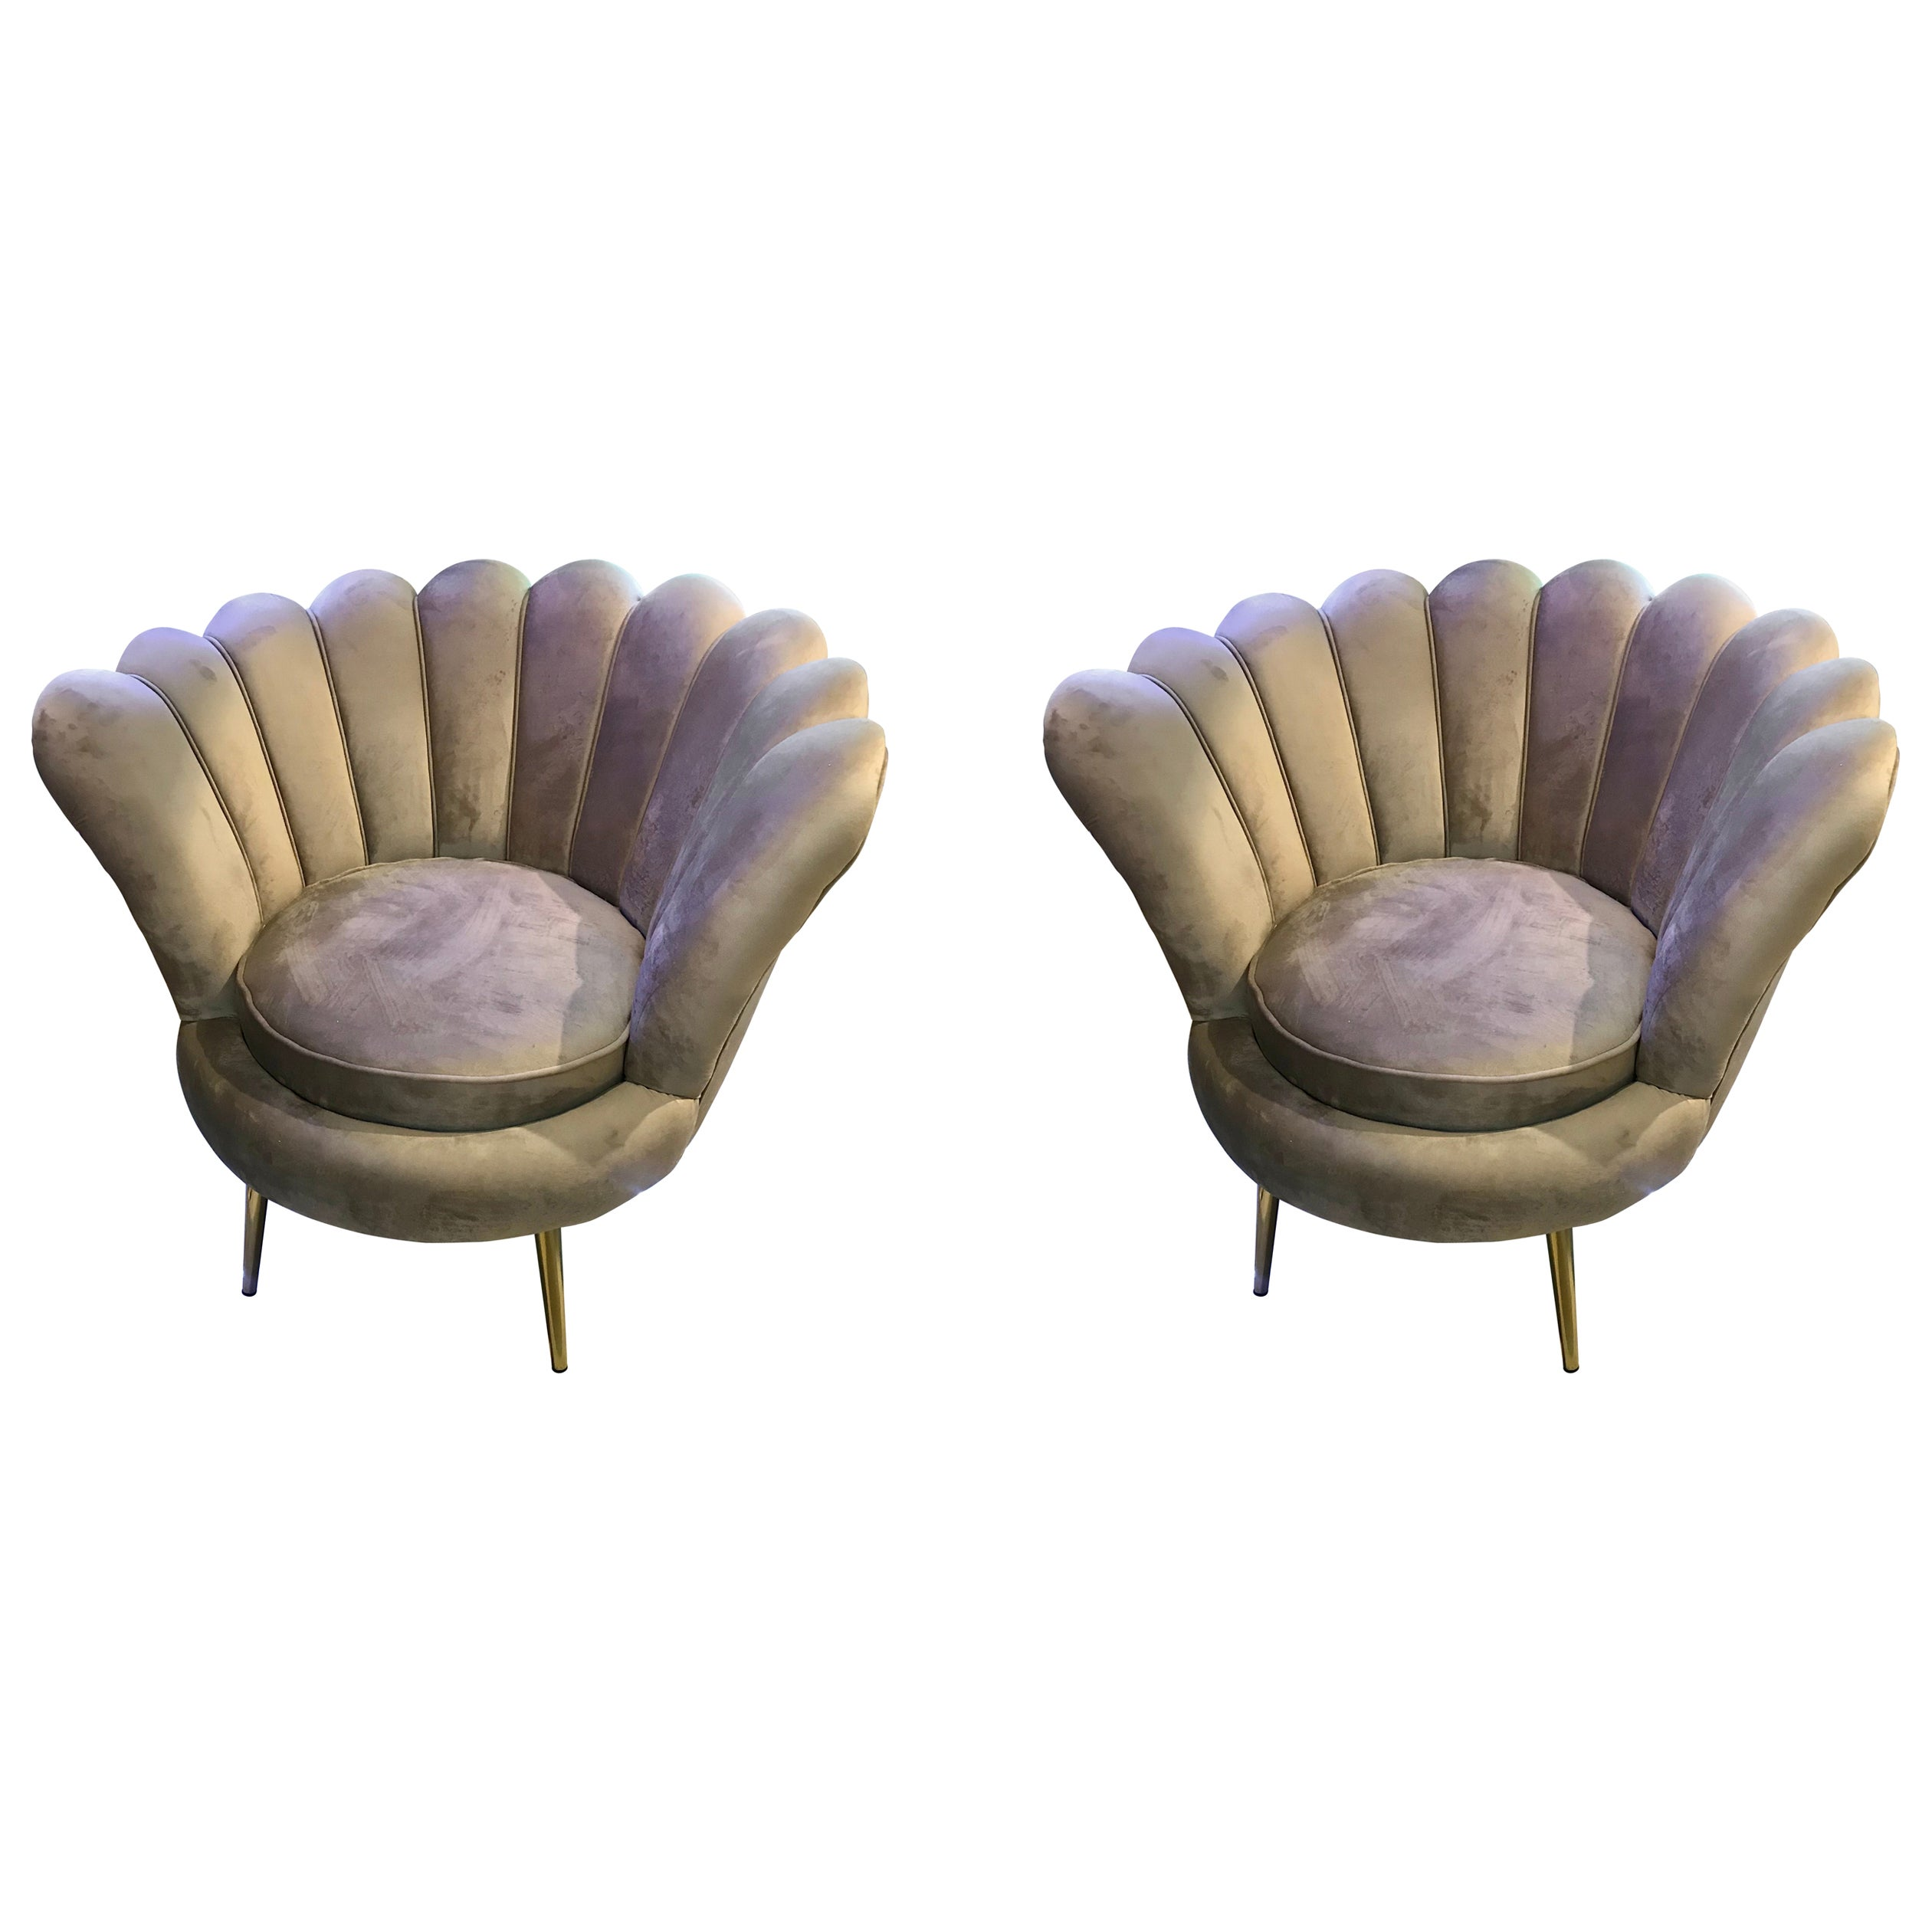 Pair of Midcentury Italian Velvet Lounge Chairs